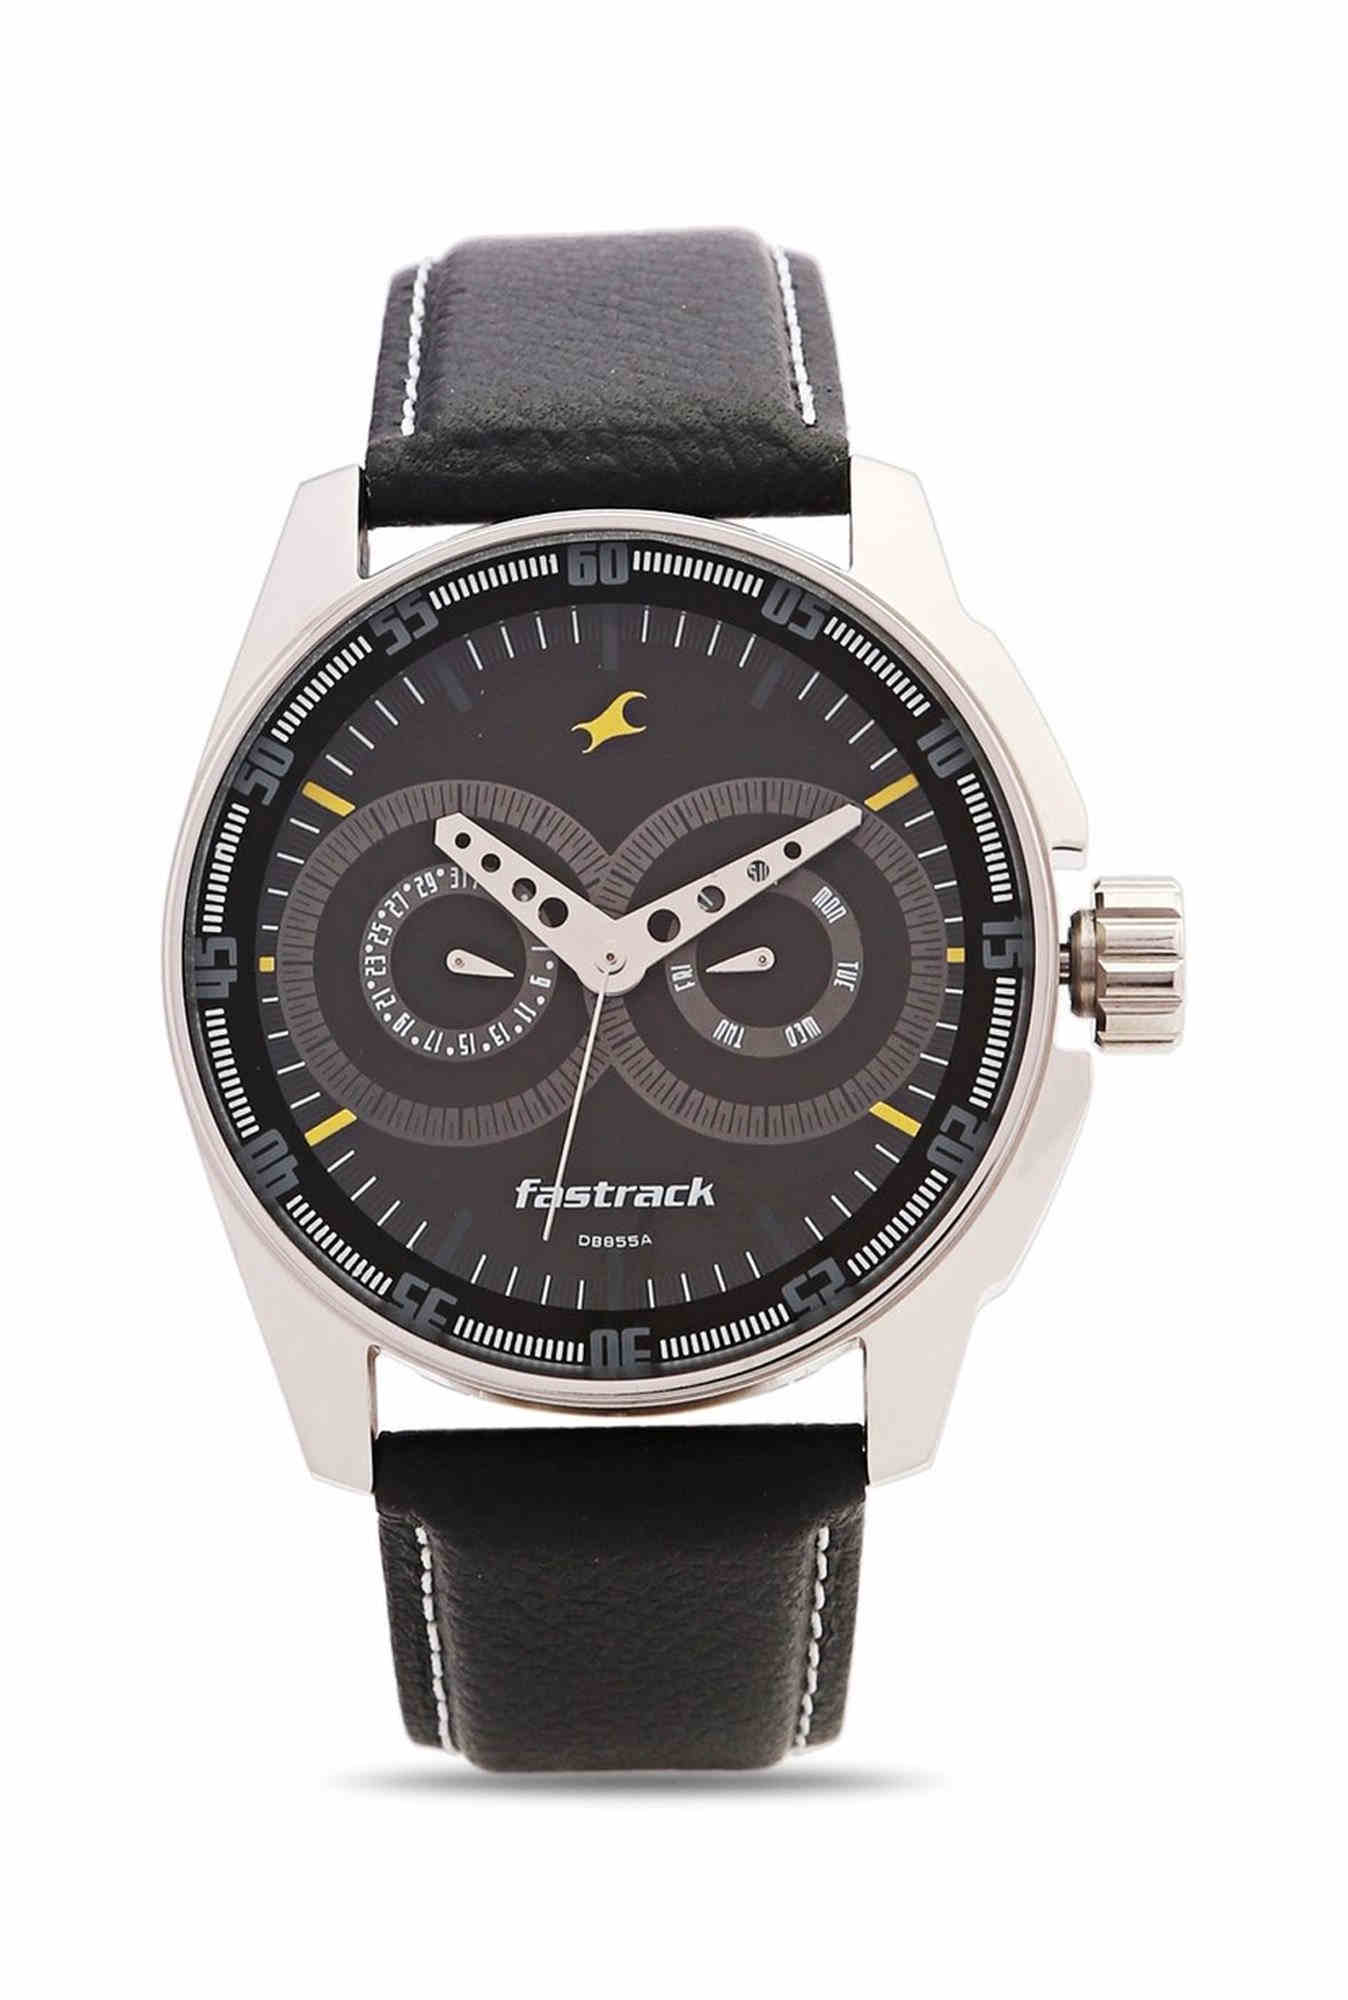 Fastrack NF3089SL02 Extreme Sports Analog Men's Watch (NF3089SL02)